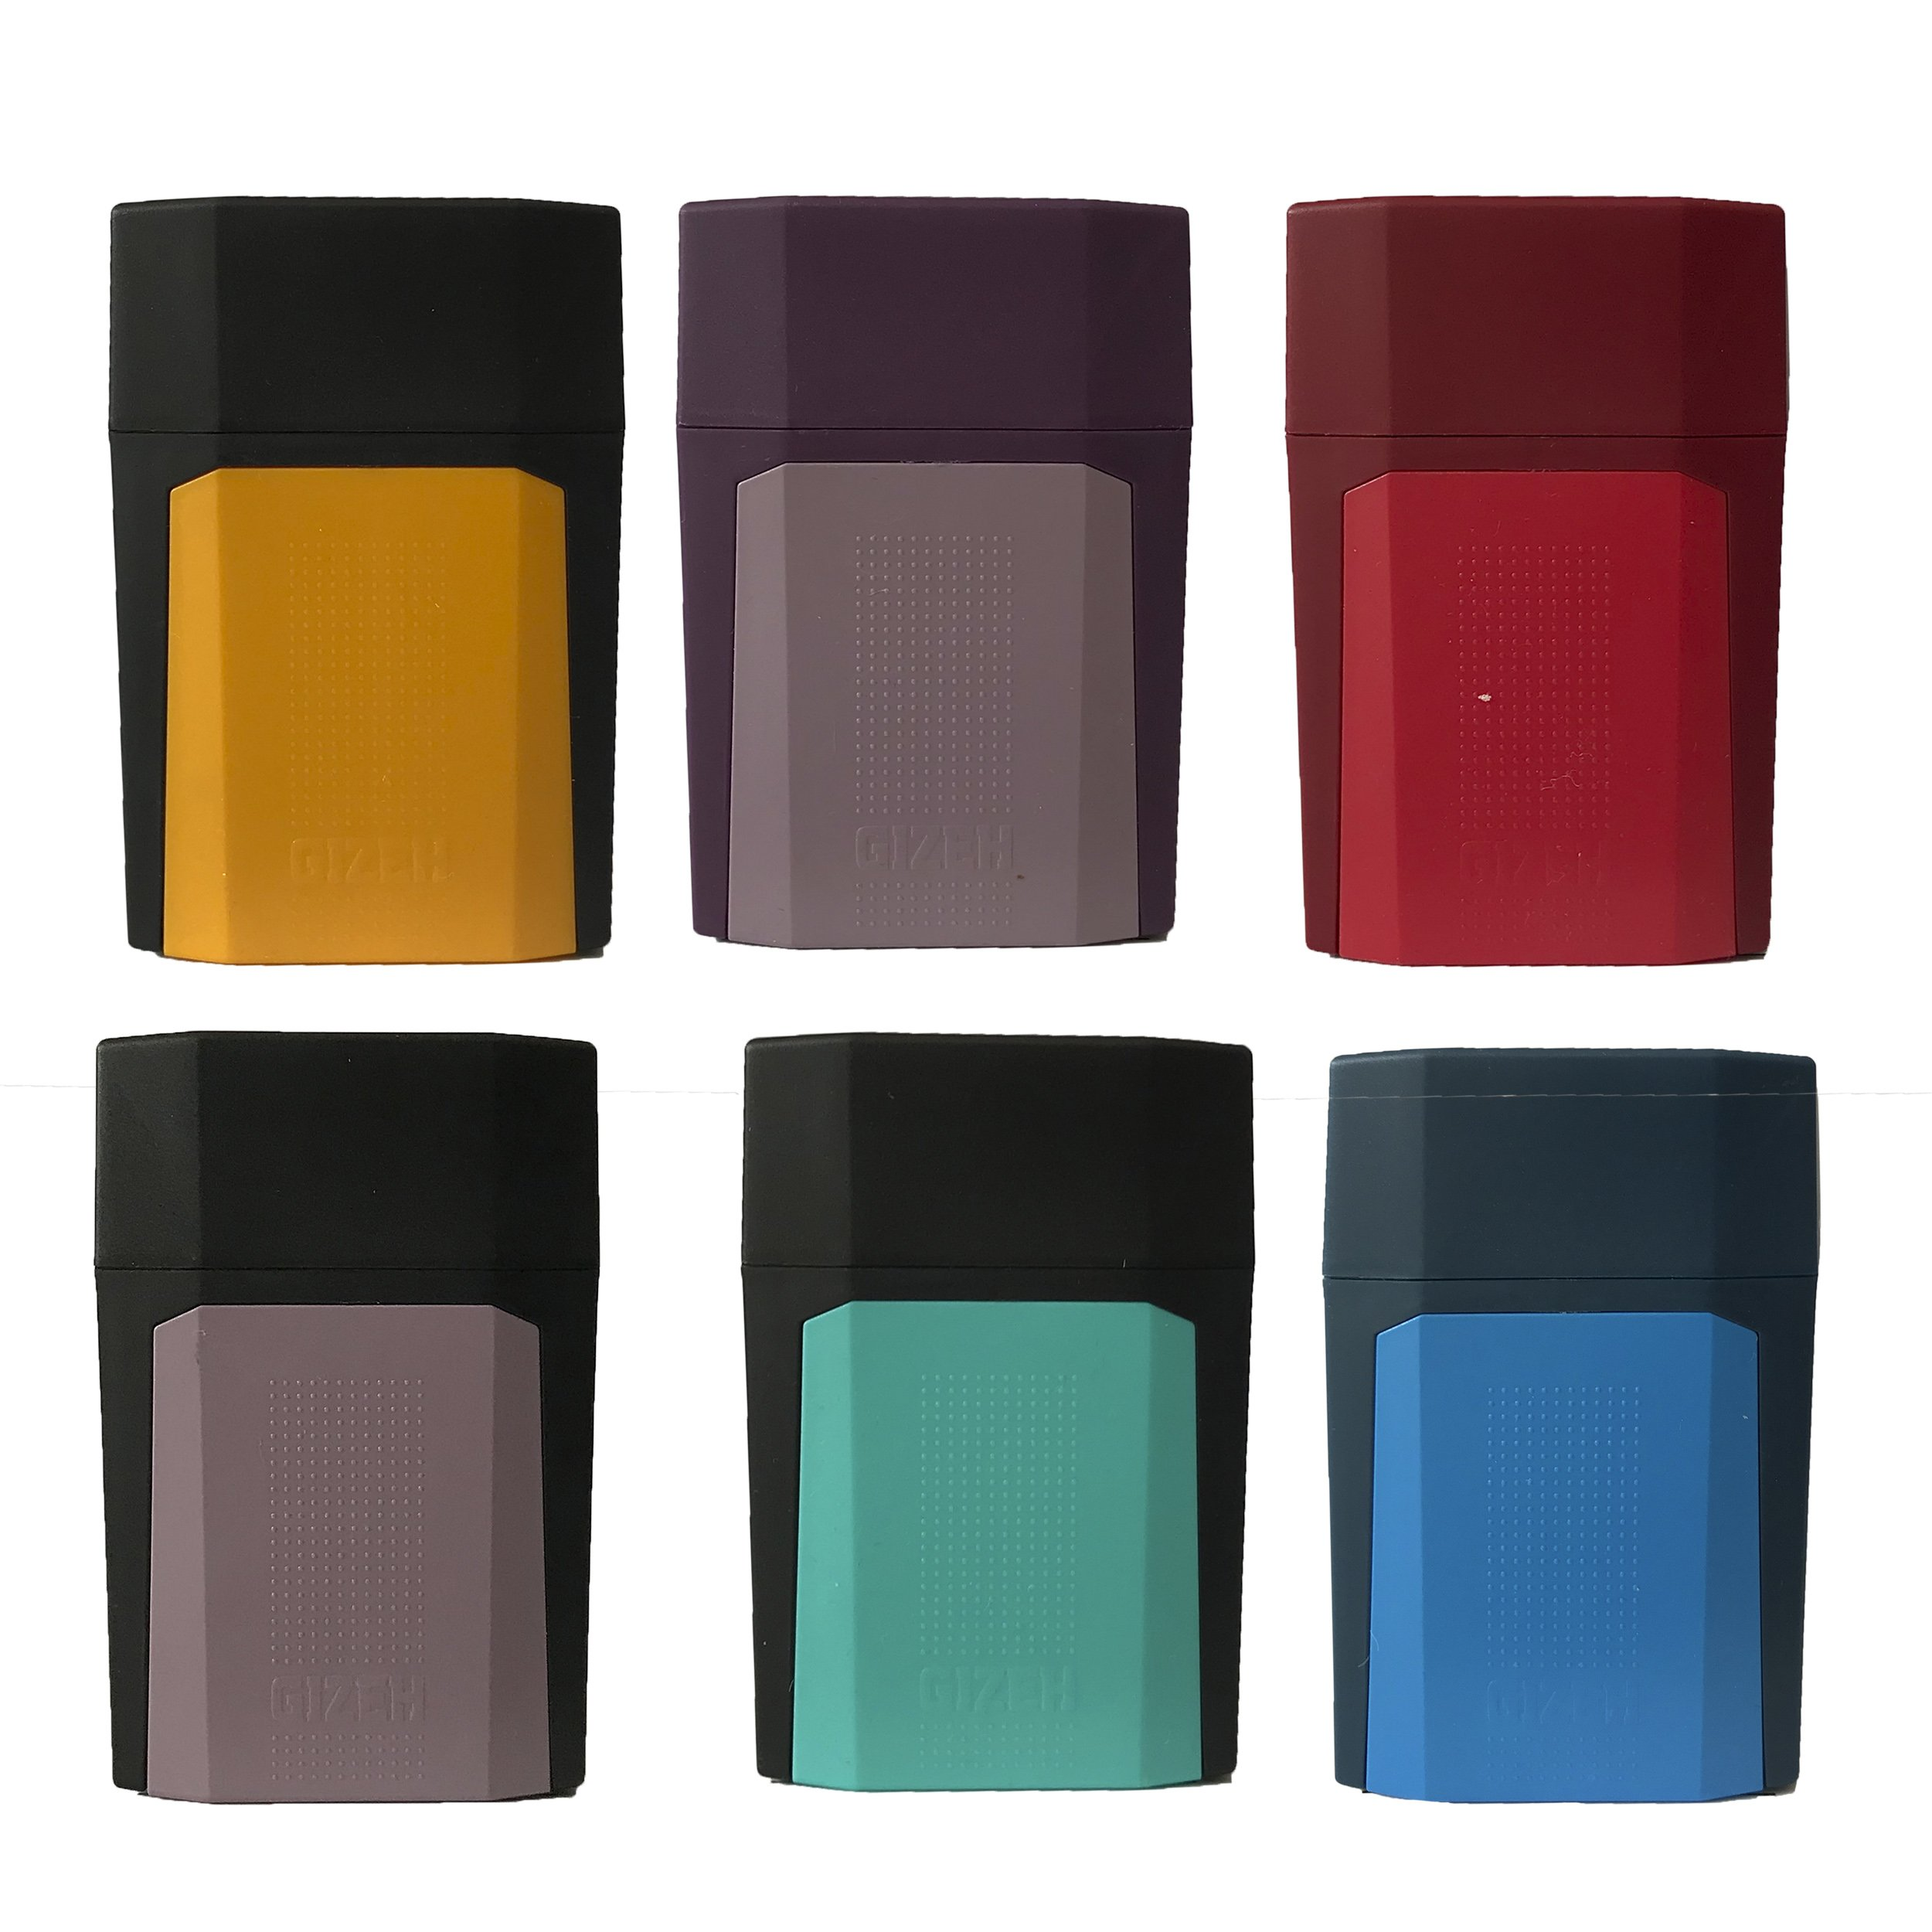 6x Gizeh Zigarettenetui´s / Gizeh Flip Cases verschiedene Farben